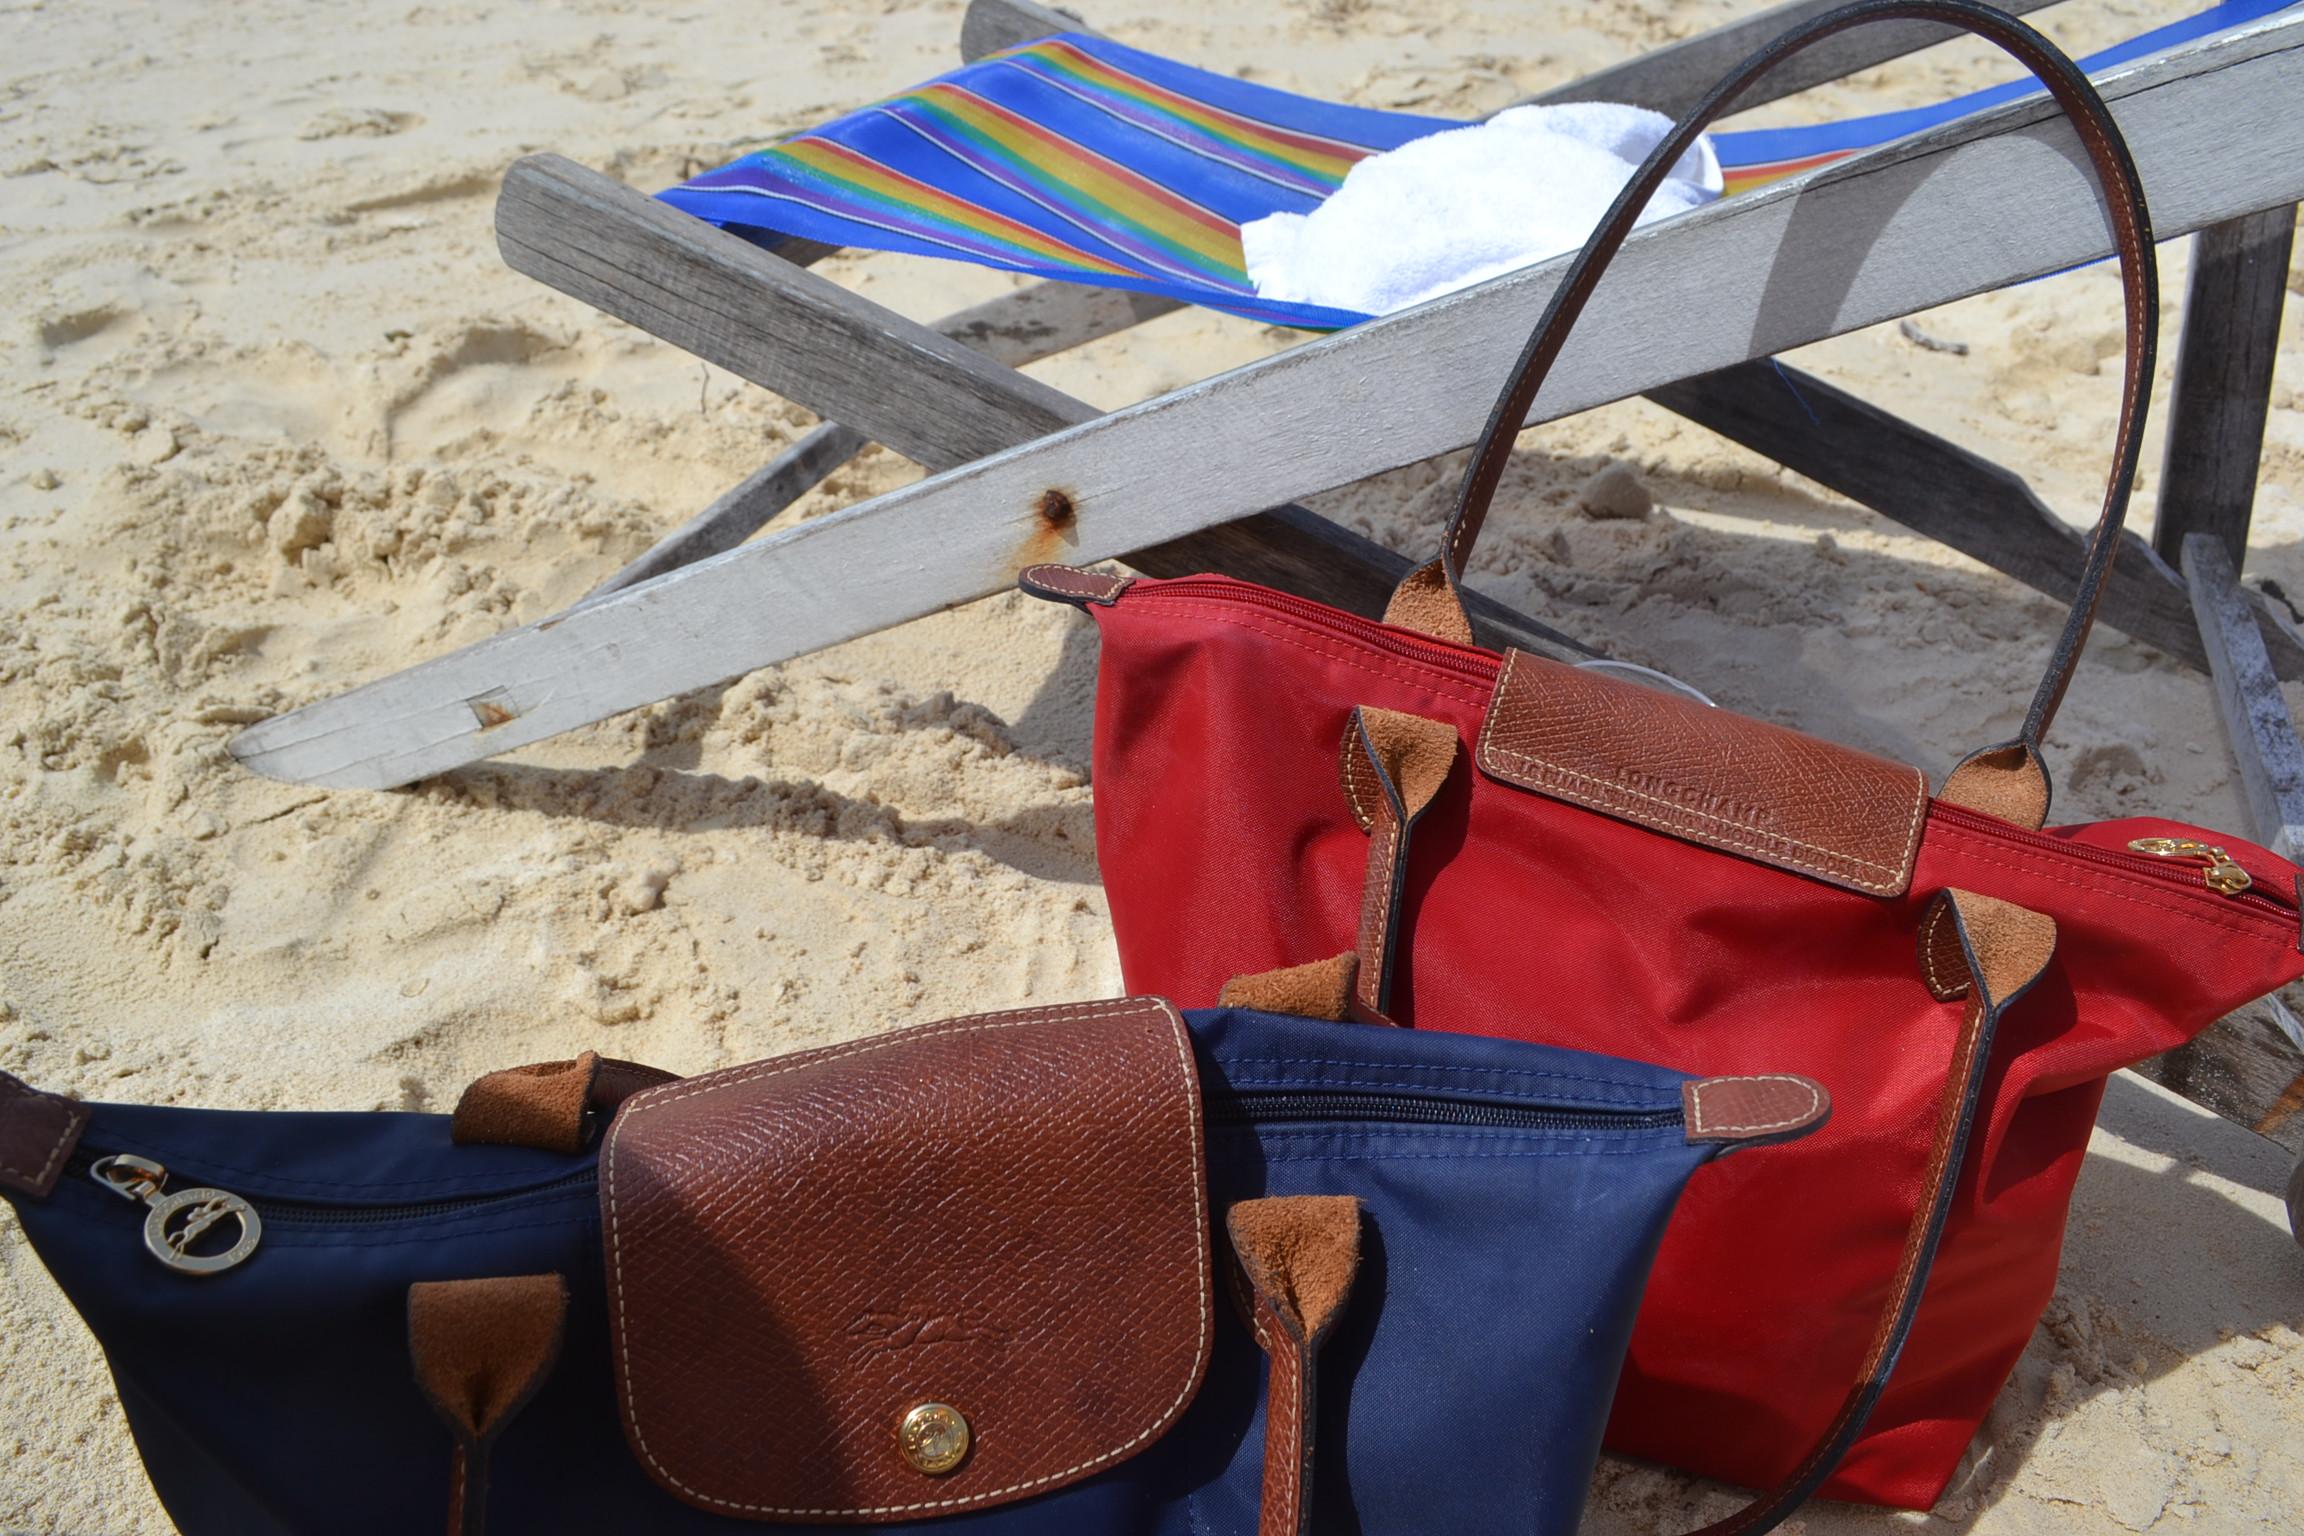 Longchamp Bag Latest Design Sale Outlet Le Pliage Neo Small Handbag 1512578545 Red Bags My